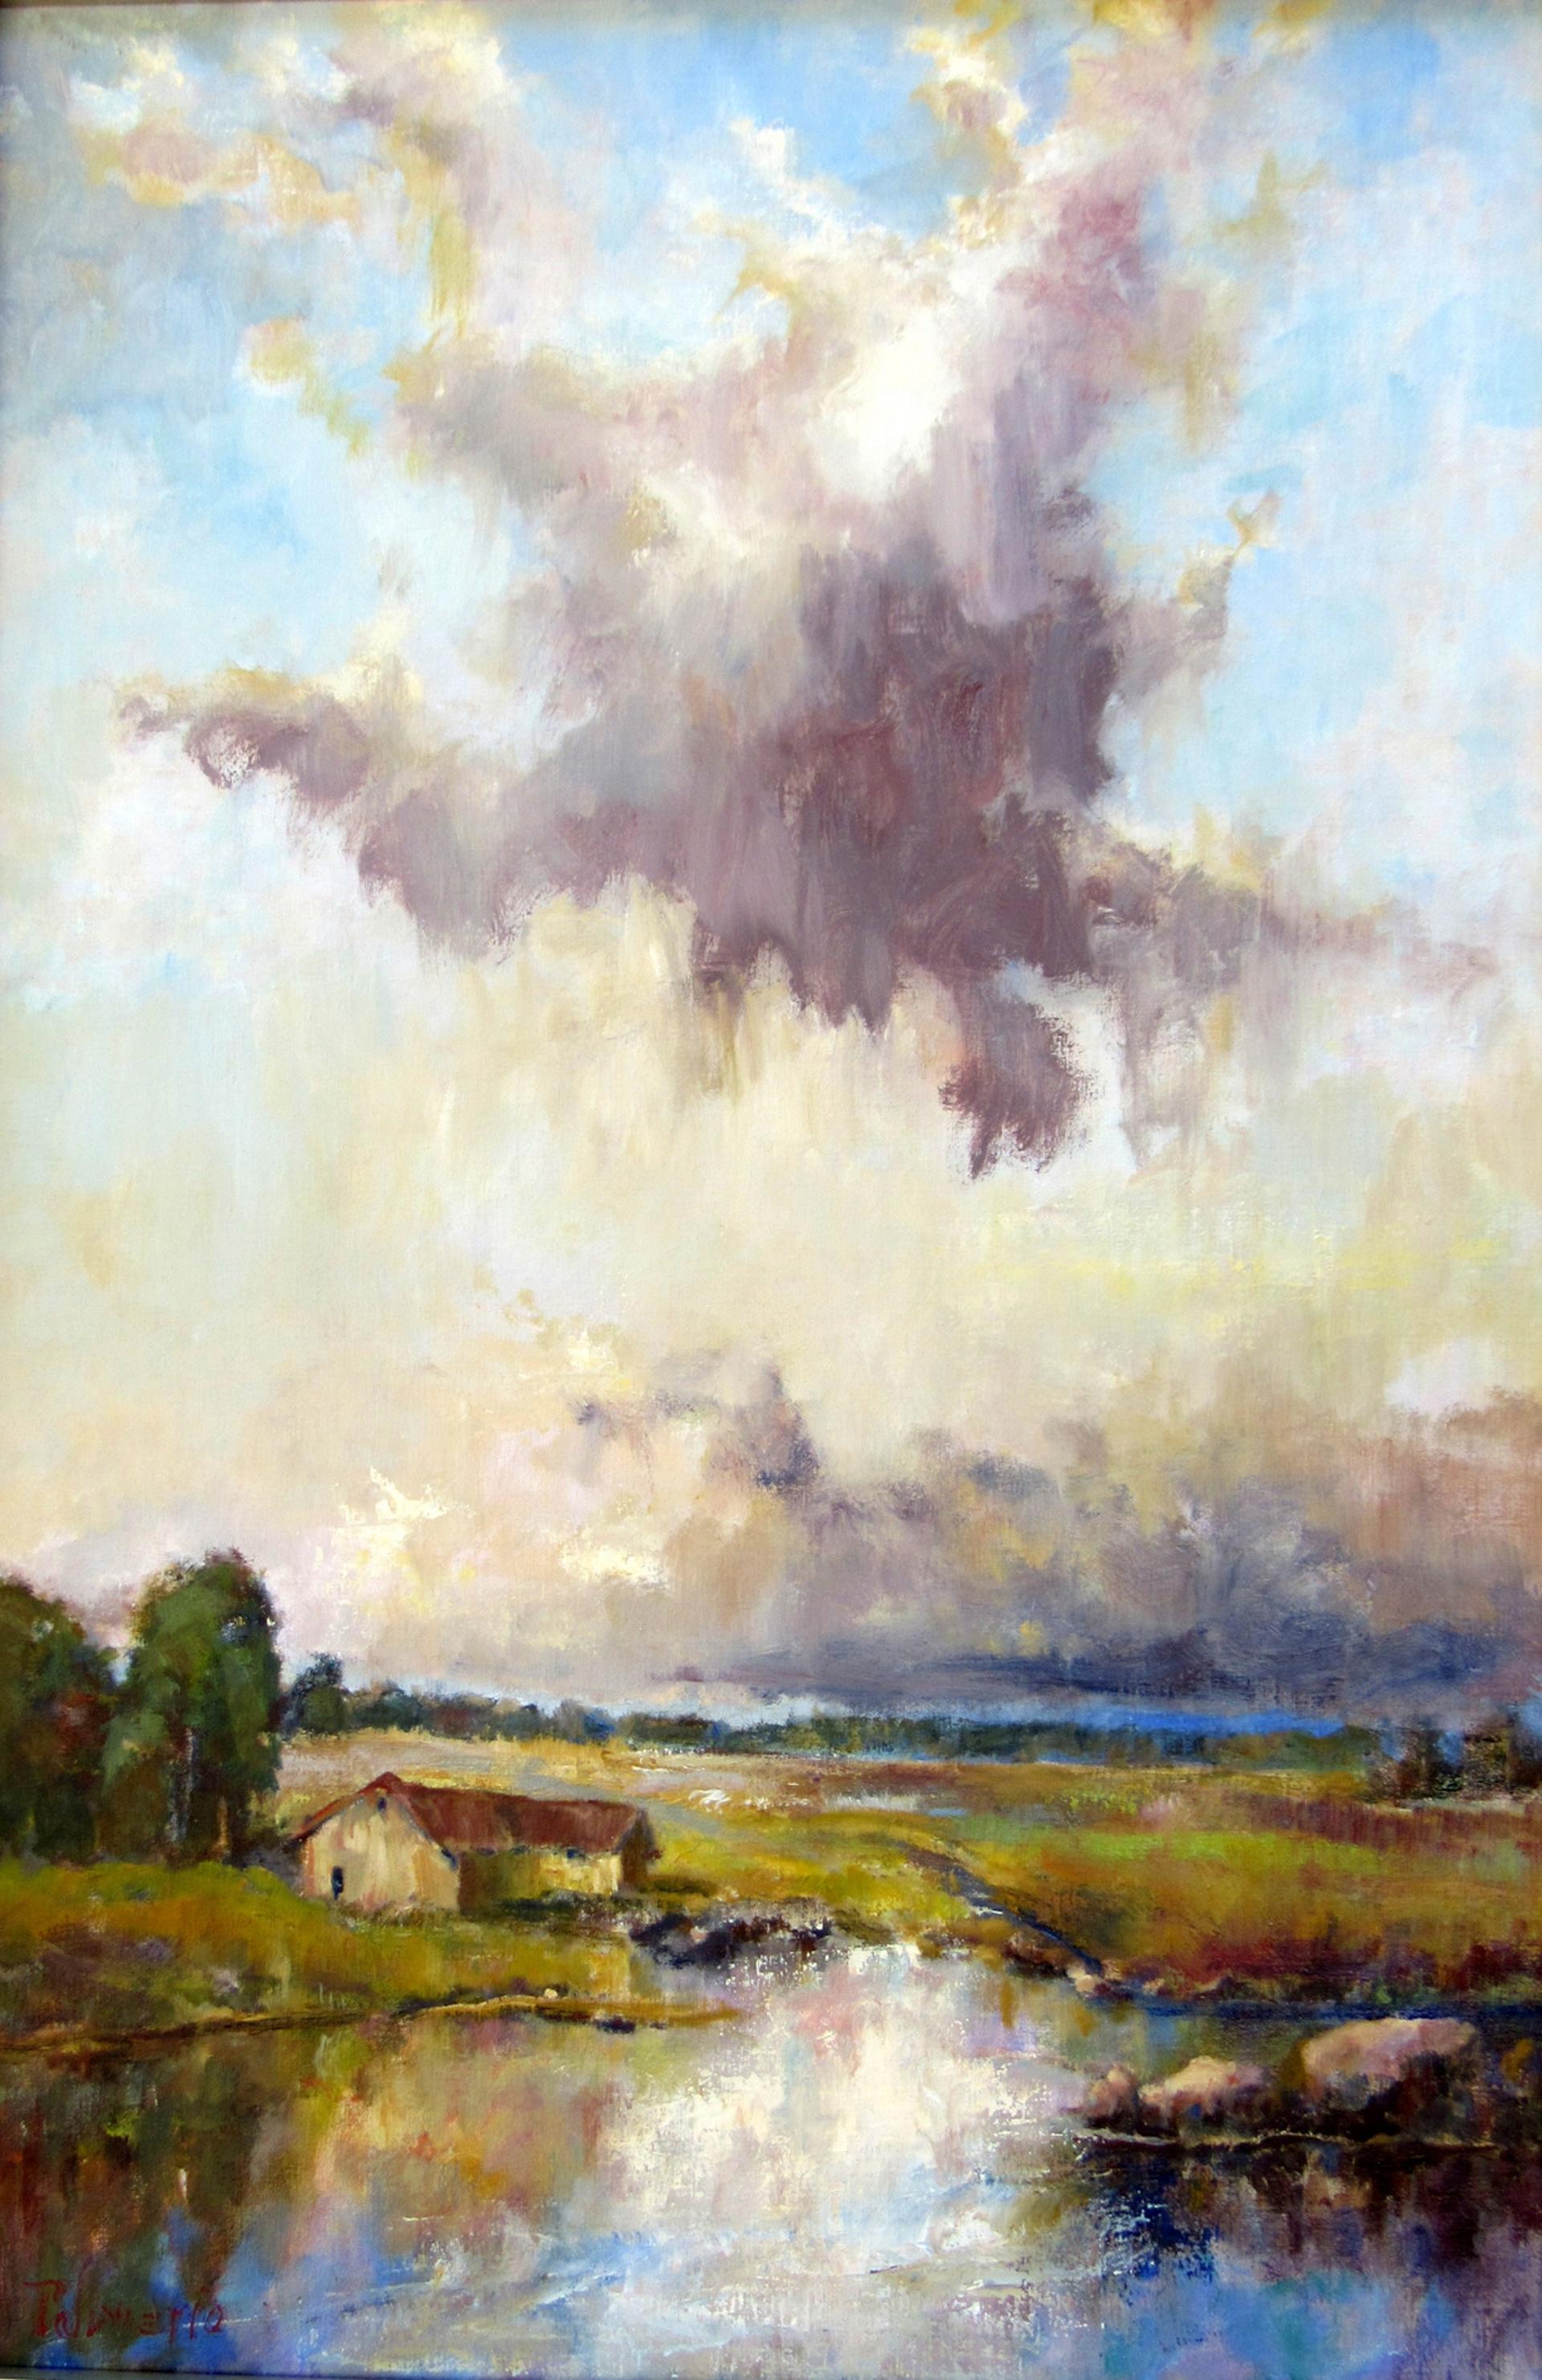 The Blue Horizon by Joe Palmerio